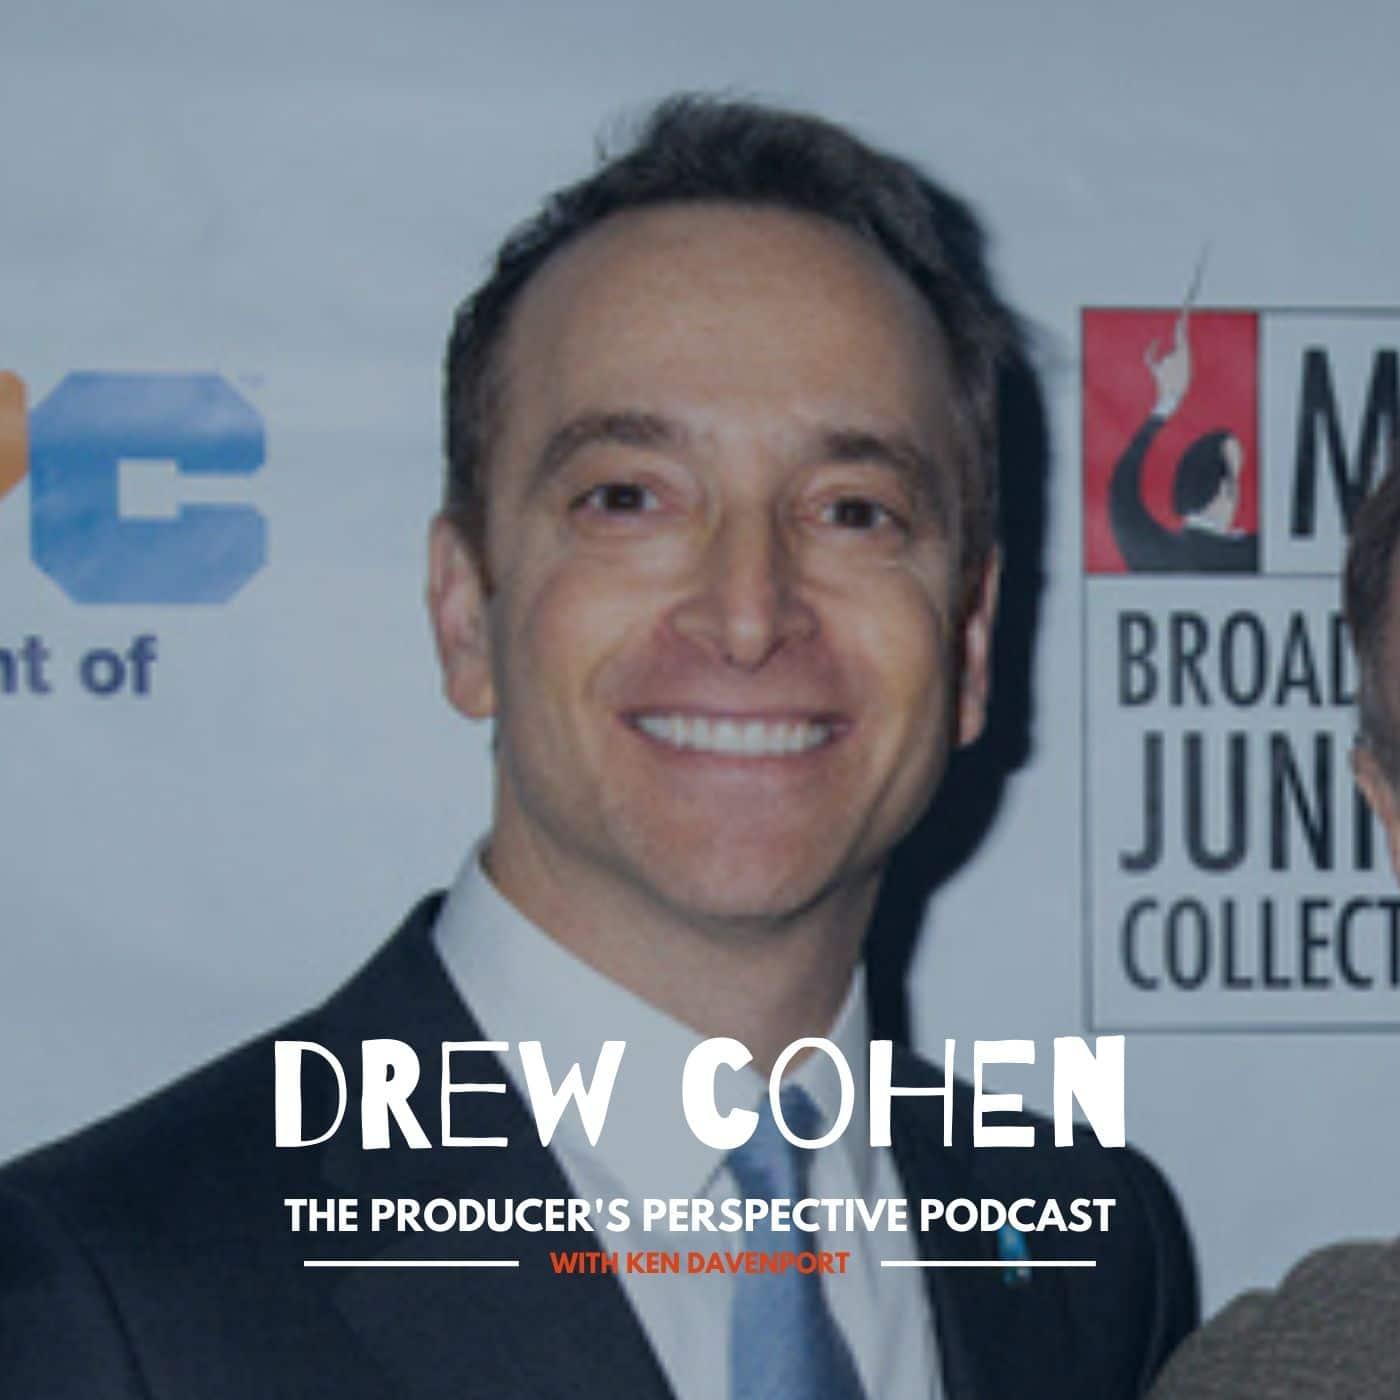 Ken Davenport's The Producer's Perspective Podcast Episode 49 - Drew Cohen